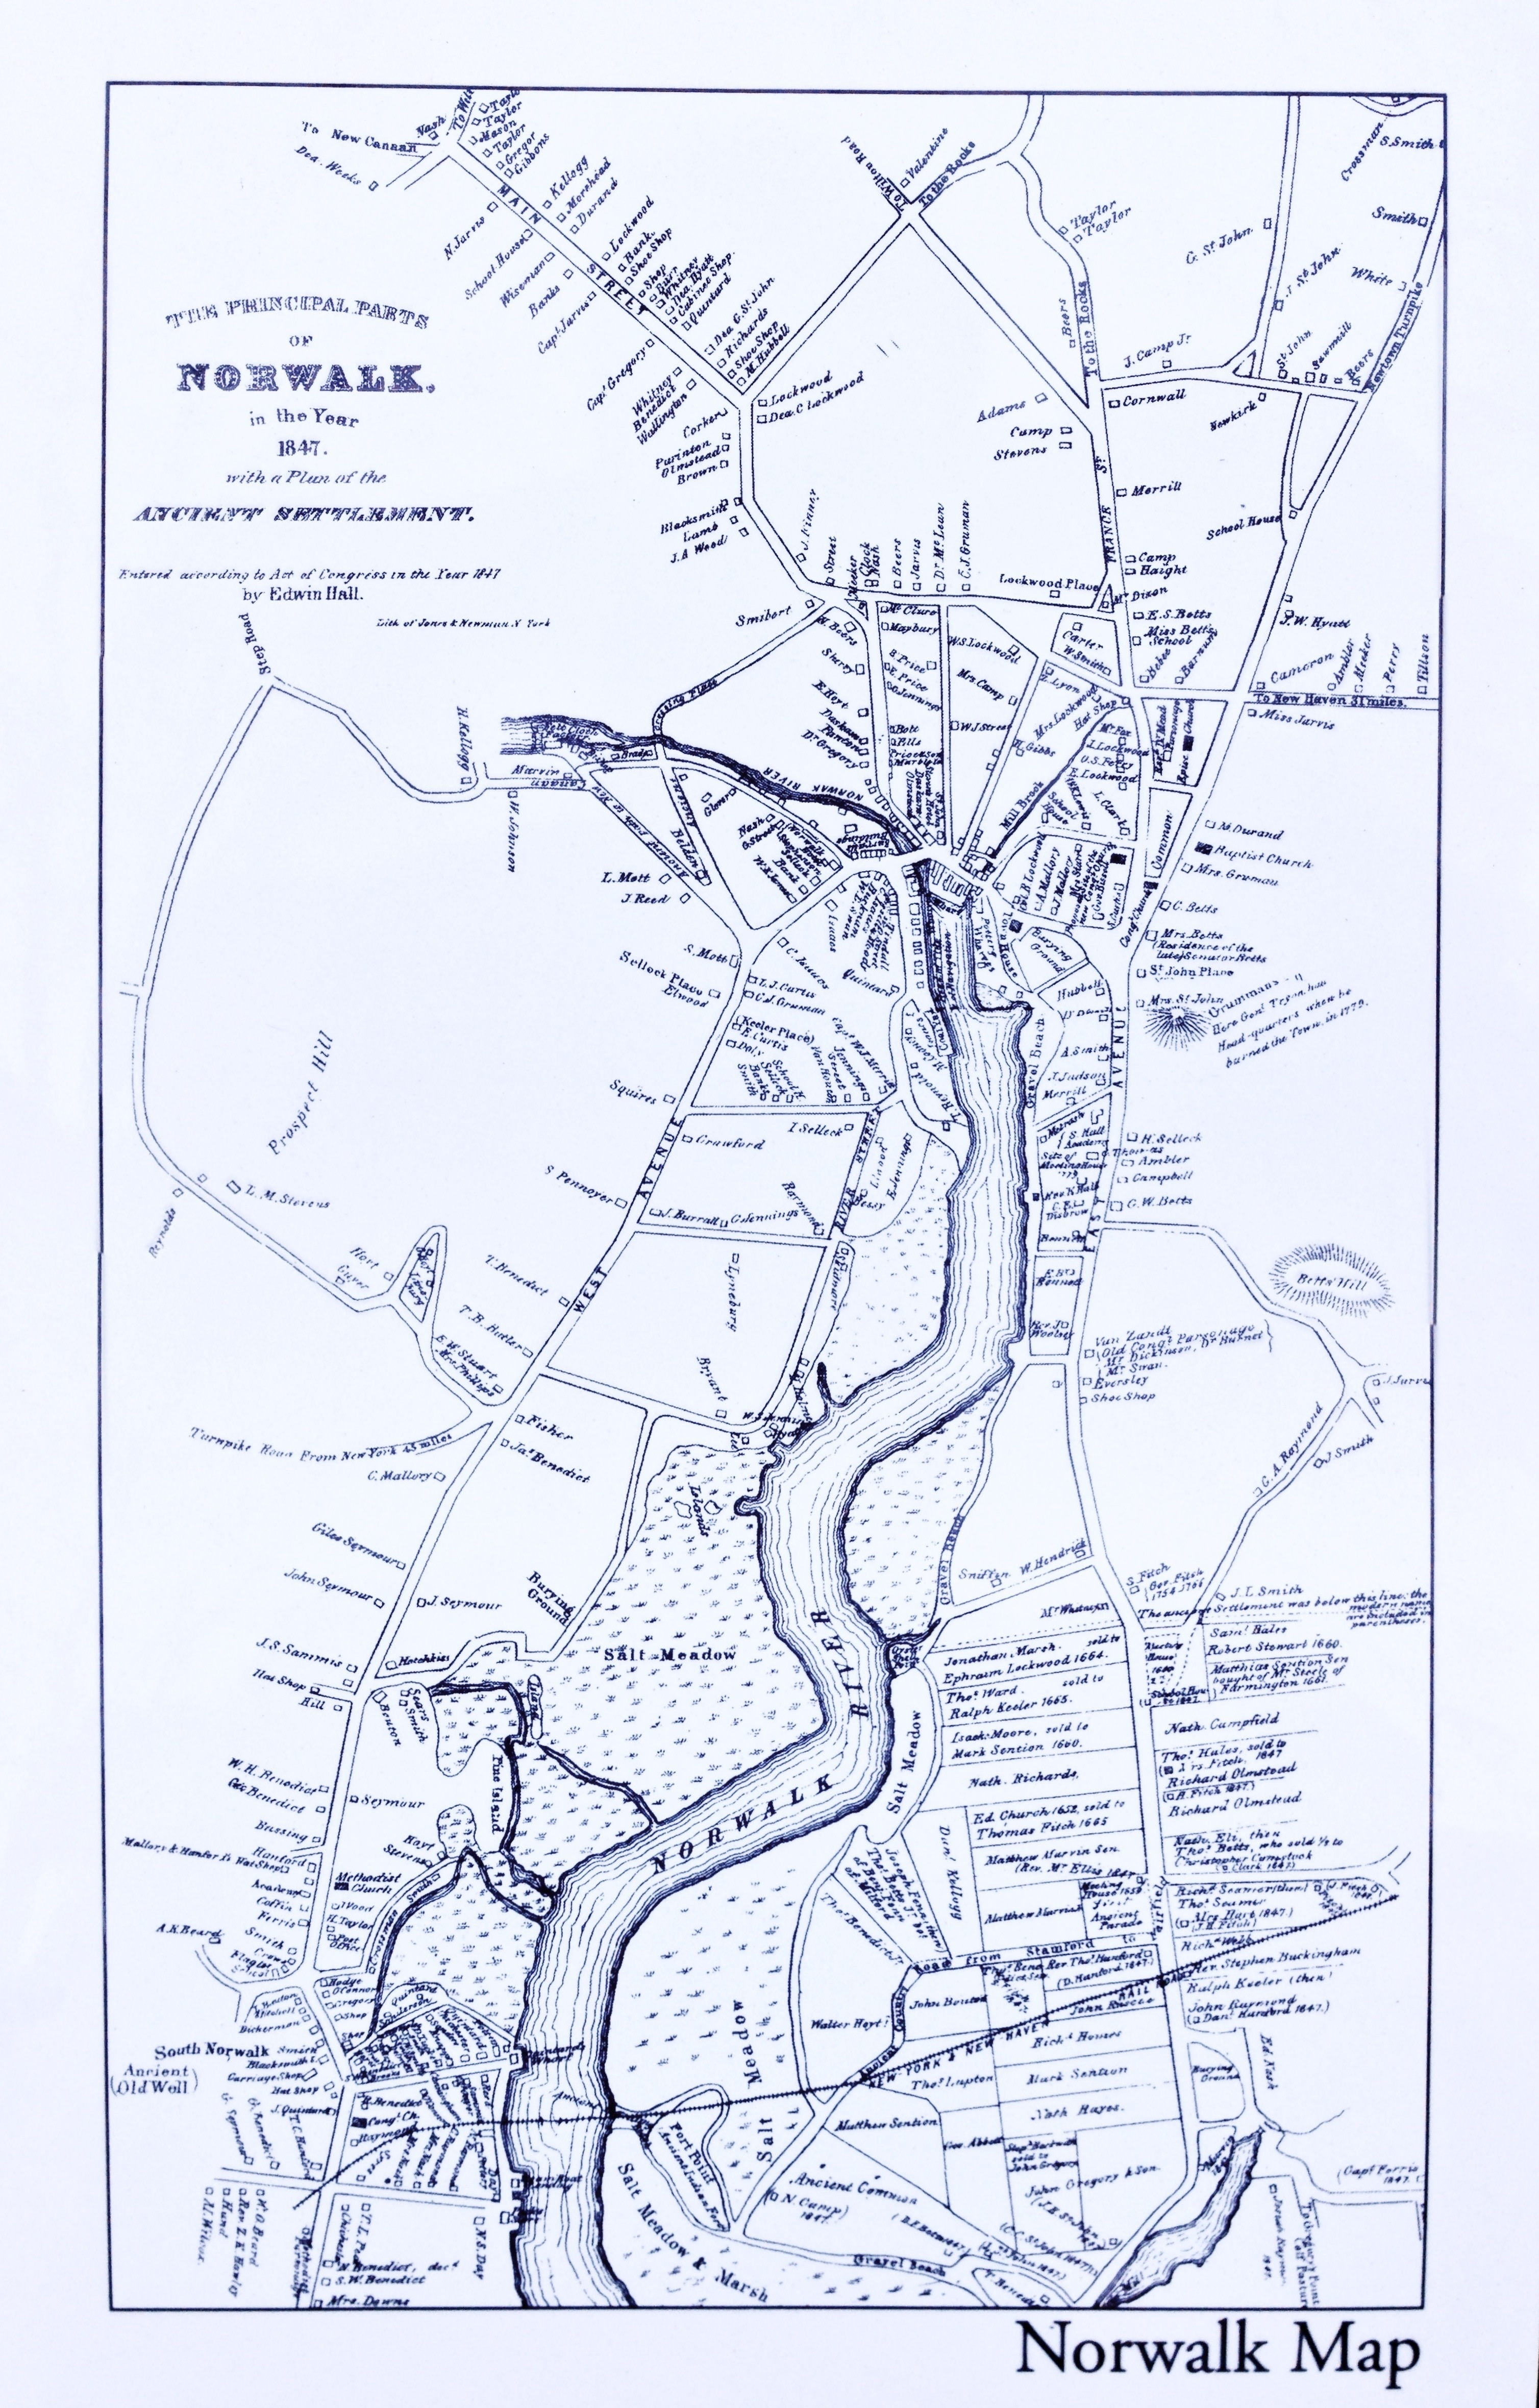 File:Norwalk 1847 Map, CT, 06854, USA.jpg - Wikimedia Commons